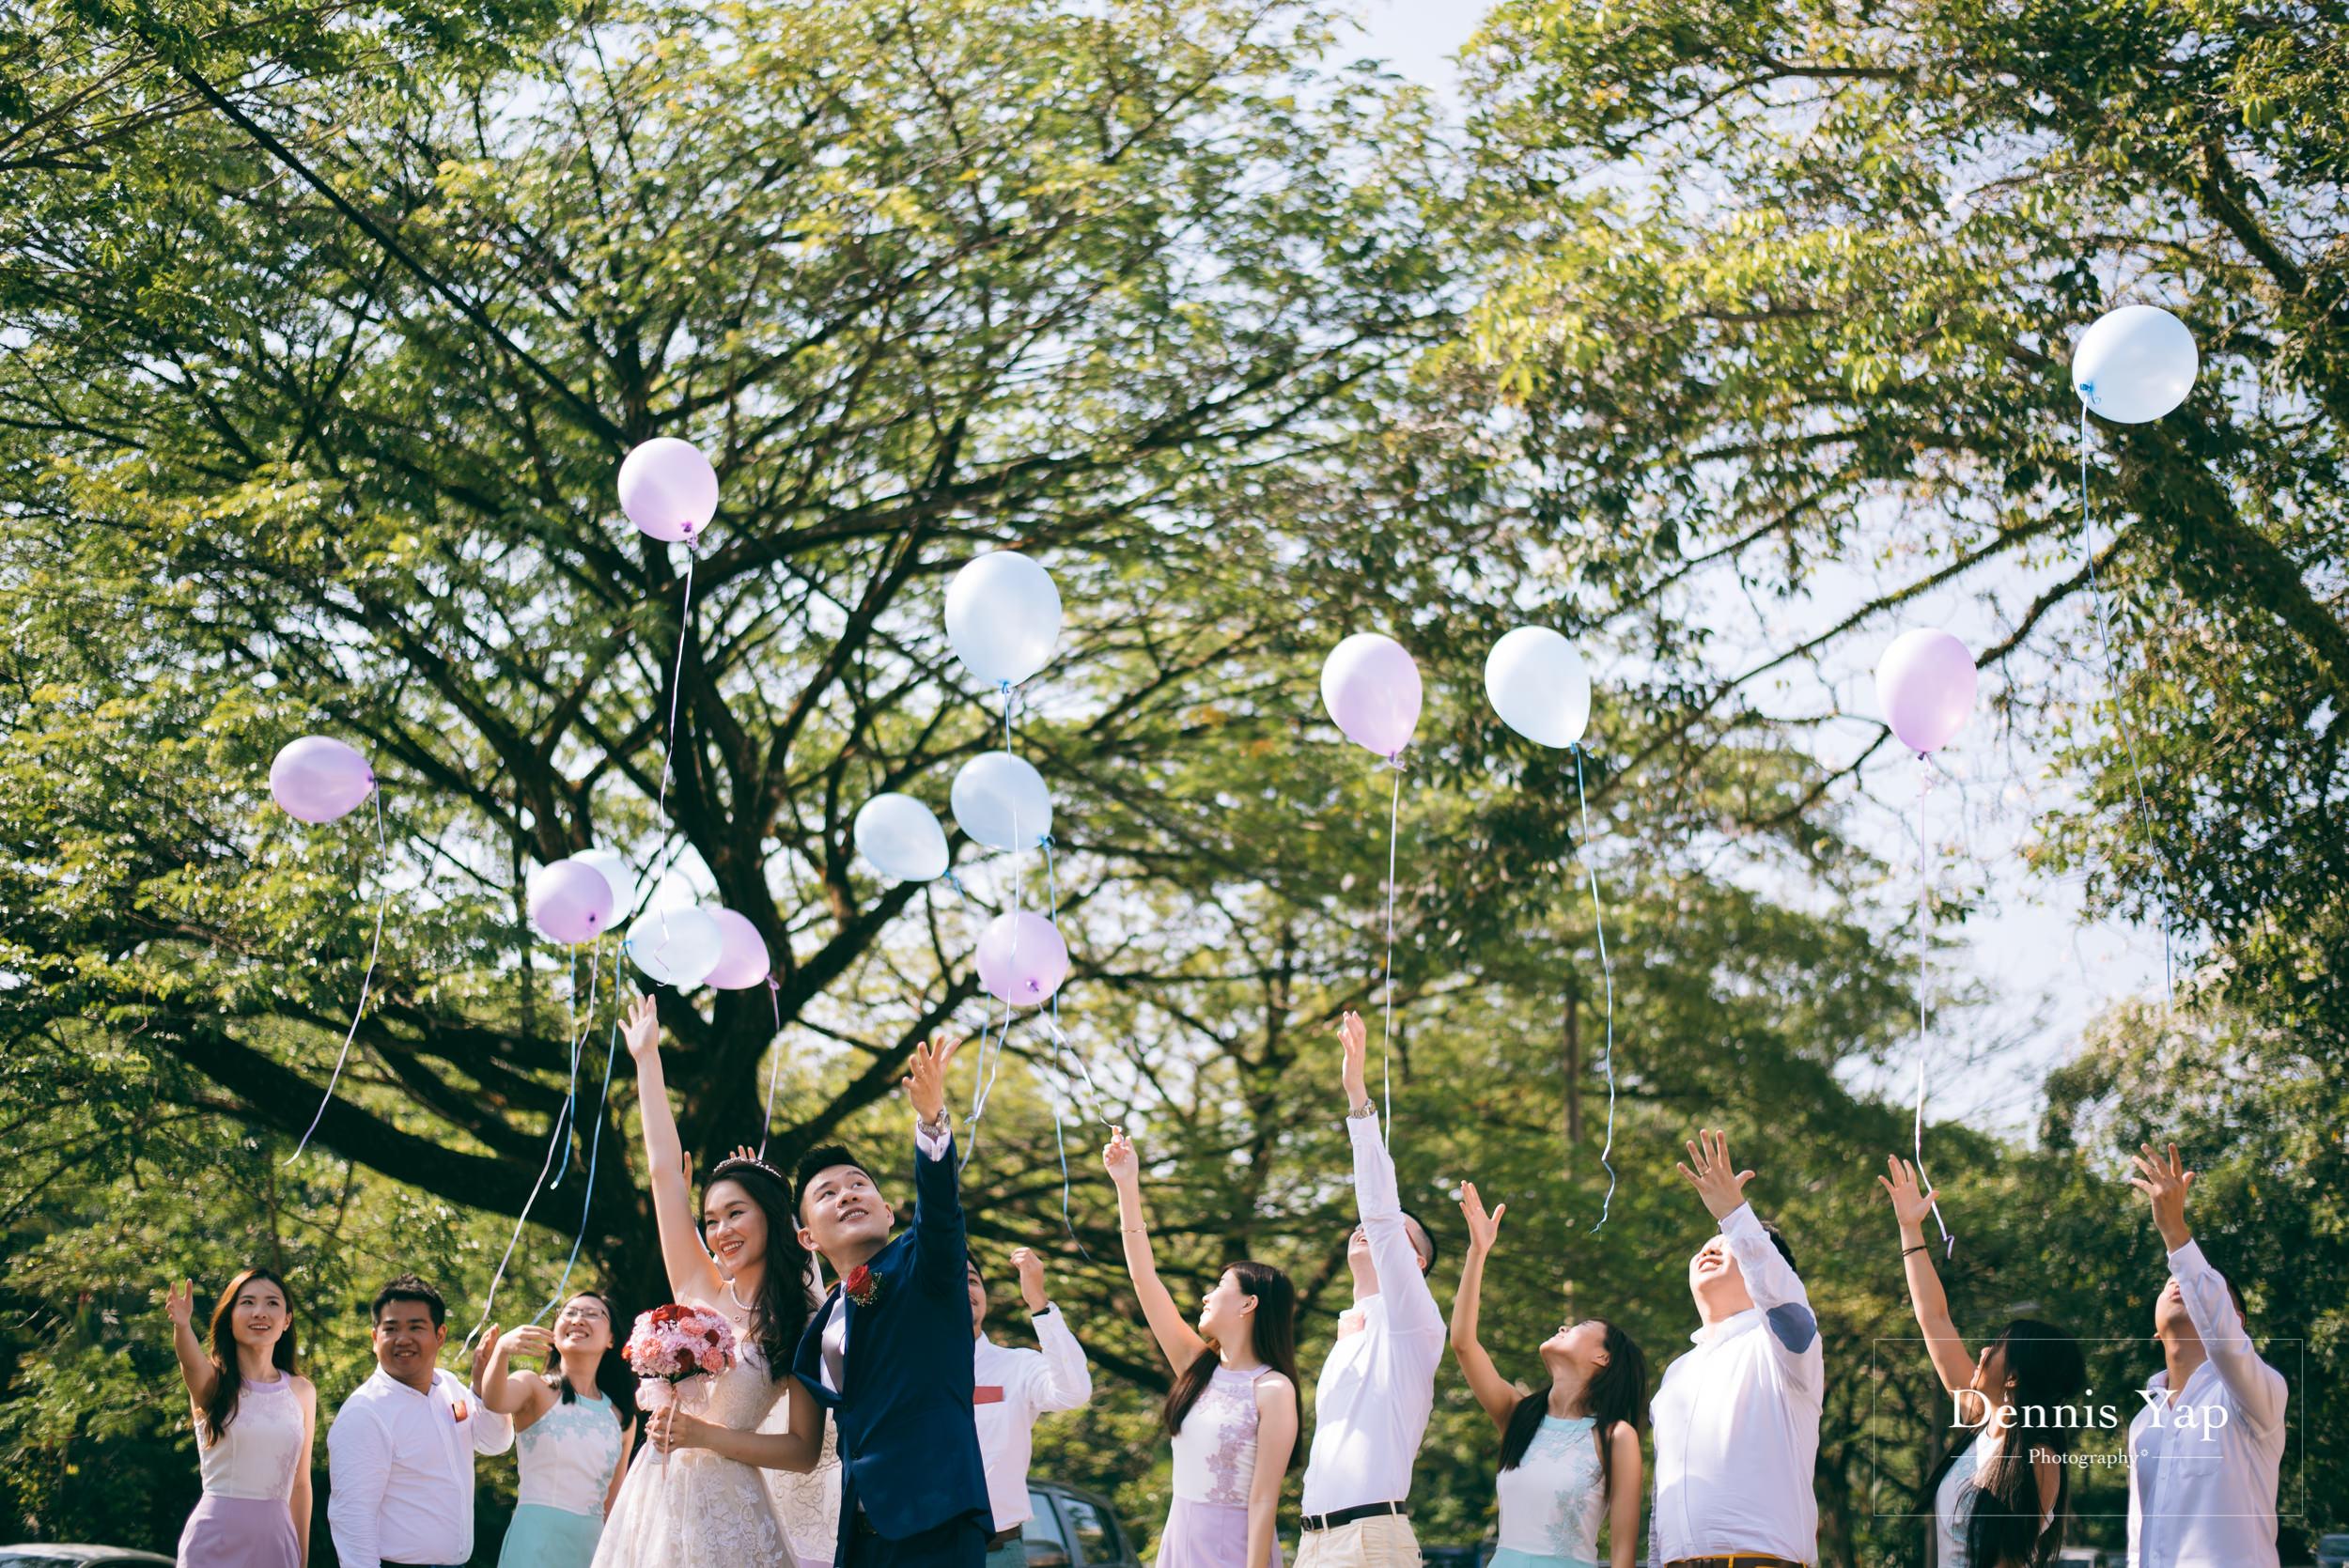 ethan juli wedding day gate crash wedding party dennis yap photography colors-38.jpg